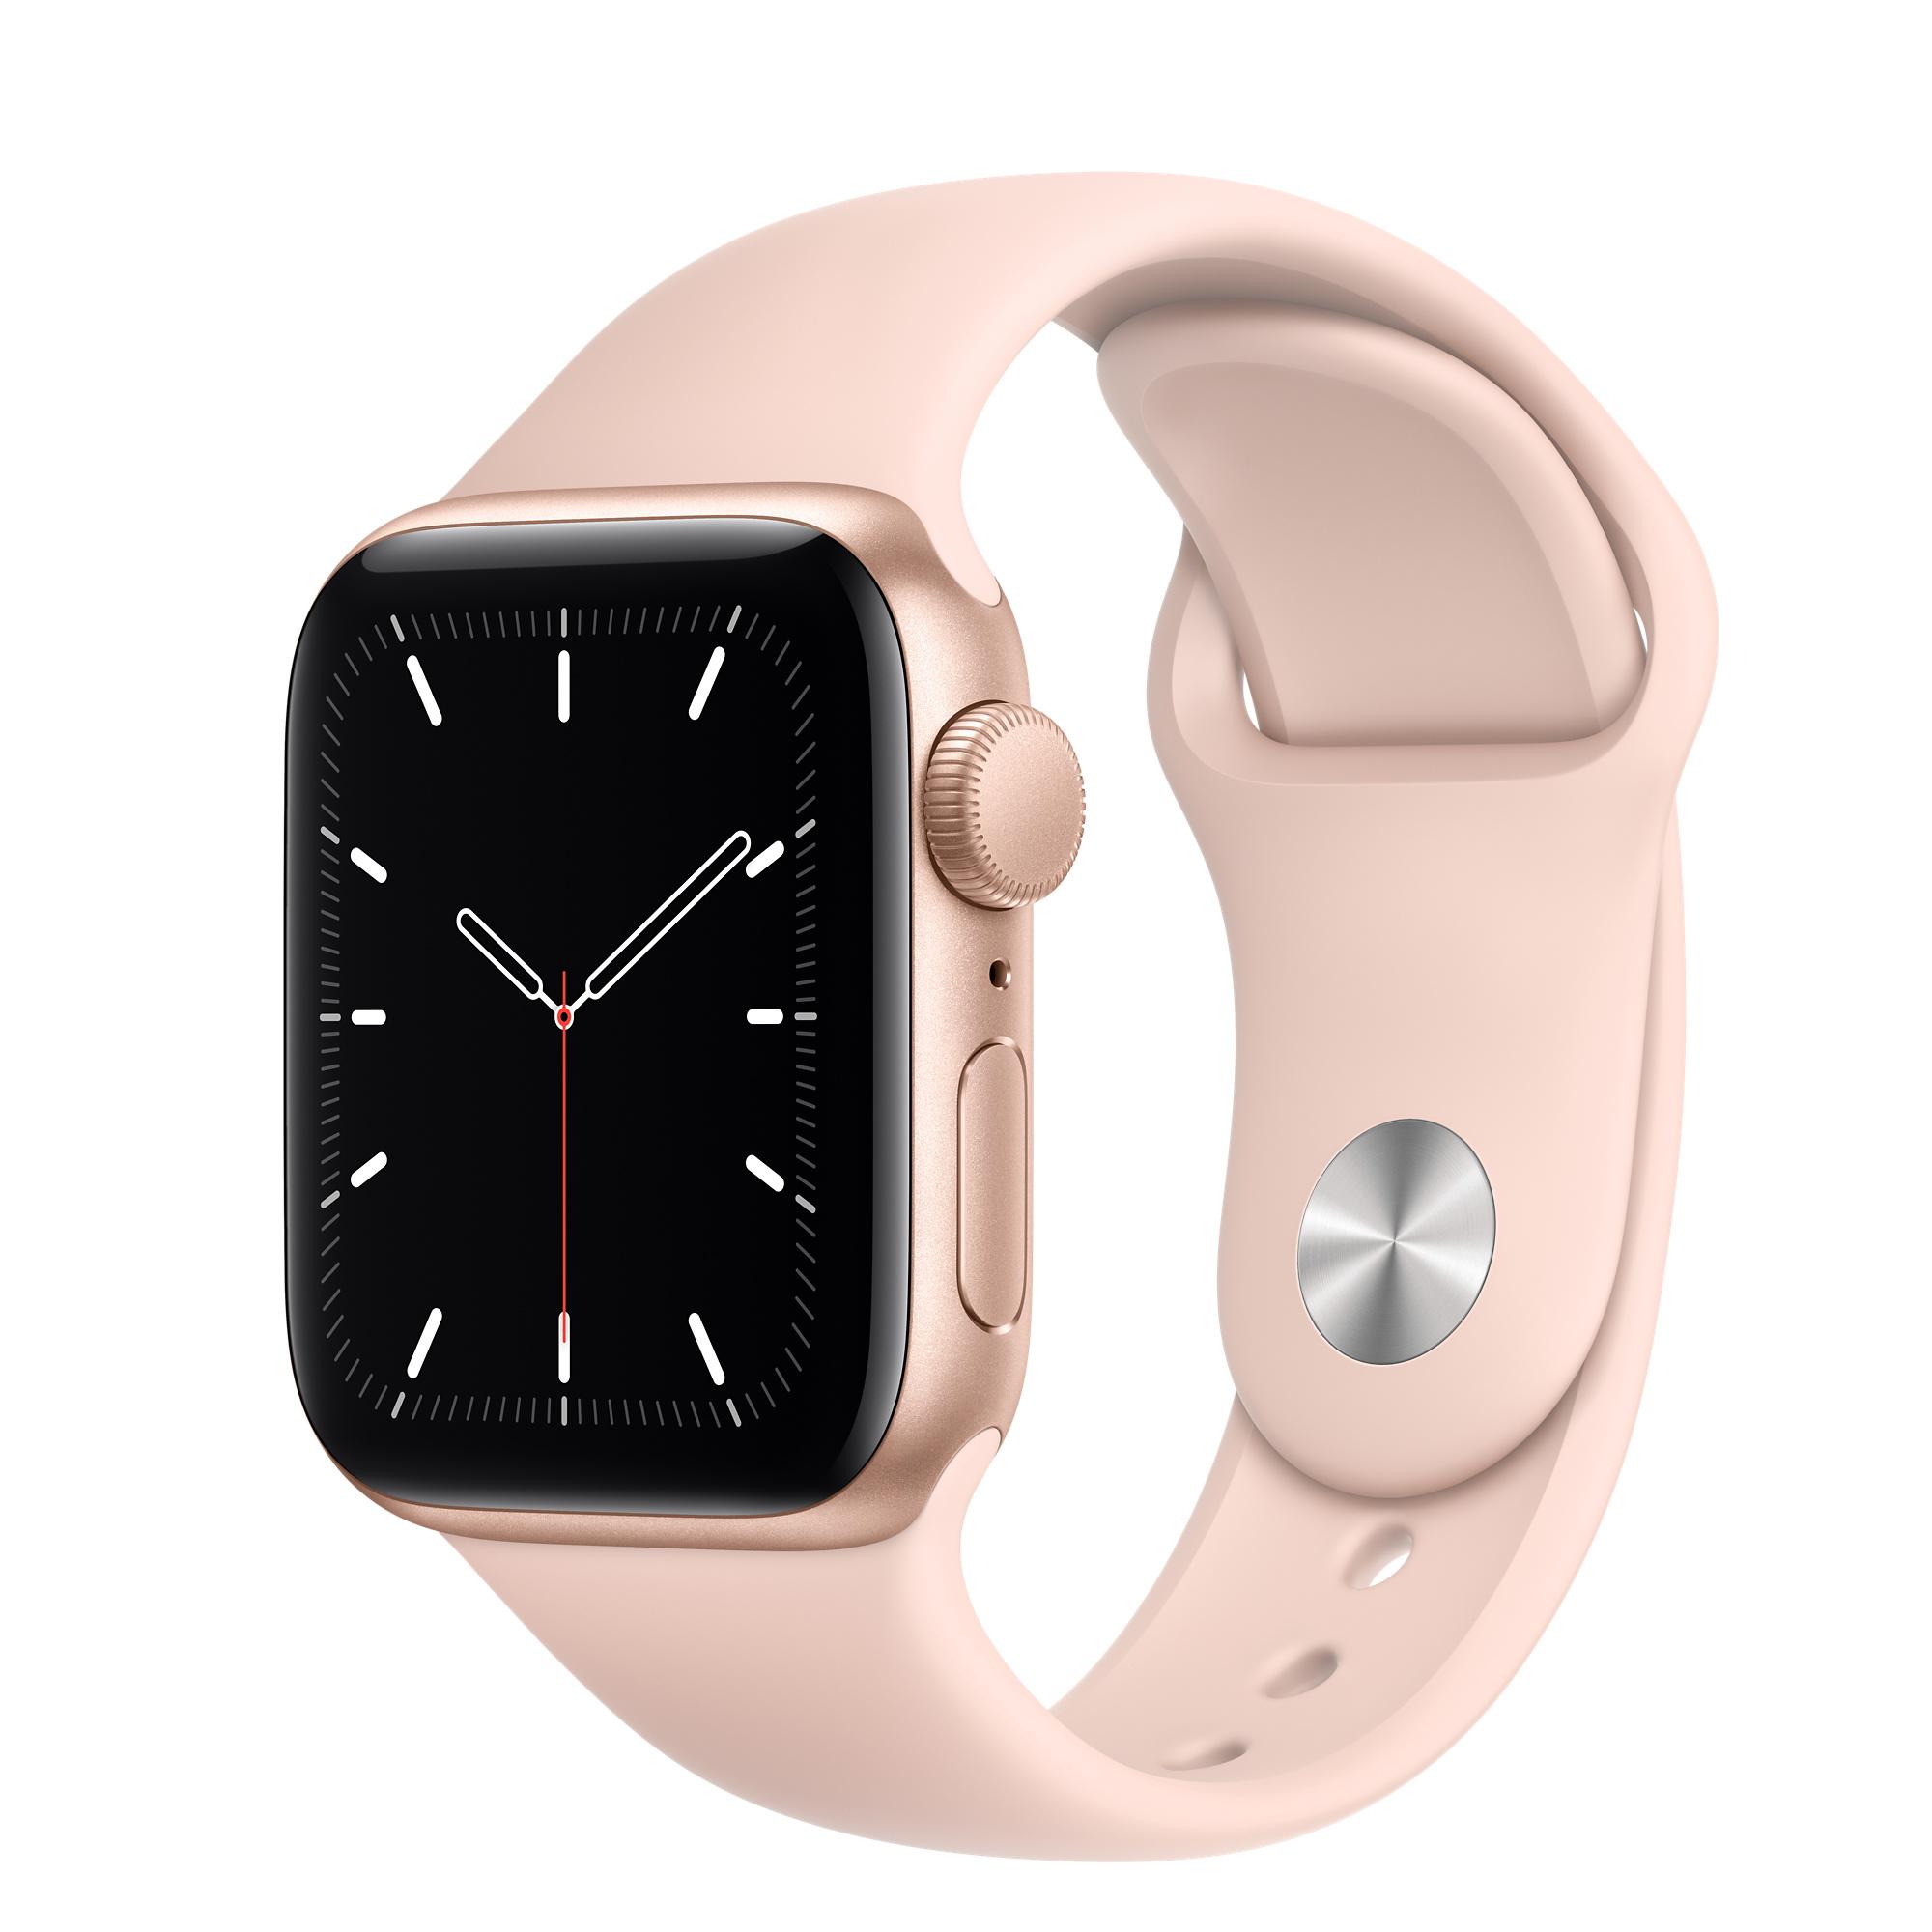 Apple Watch Se Gps 40mm Gold Aluminum Case With Pink Sand Sport Band Regular Apple